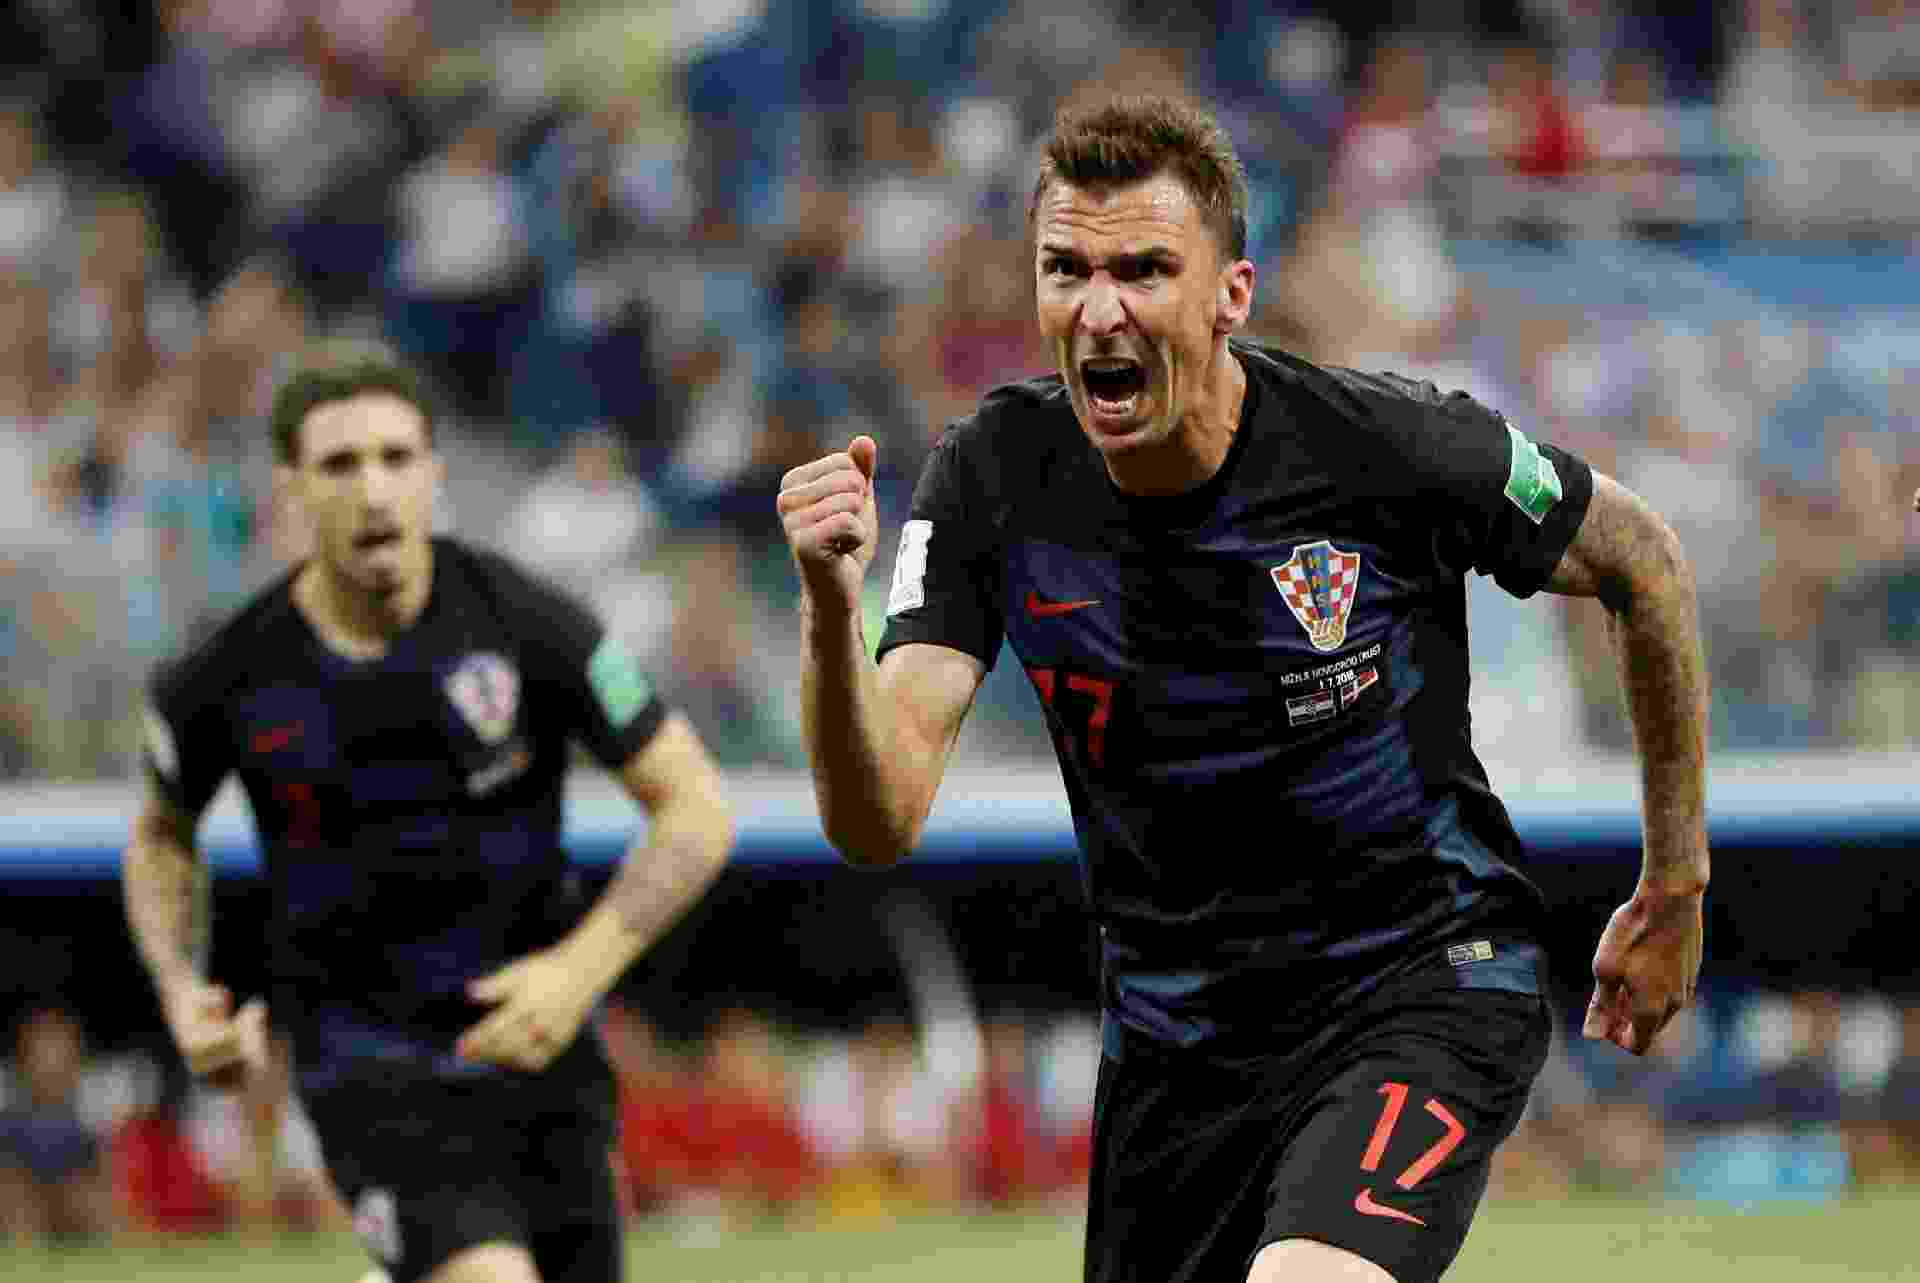 Mario Mandzukic comemora gol da Croácia contra a Dinamarca - Darren Staples/Reuters